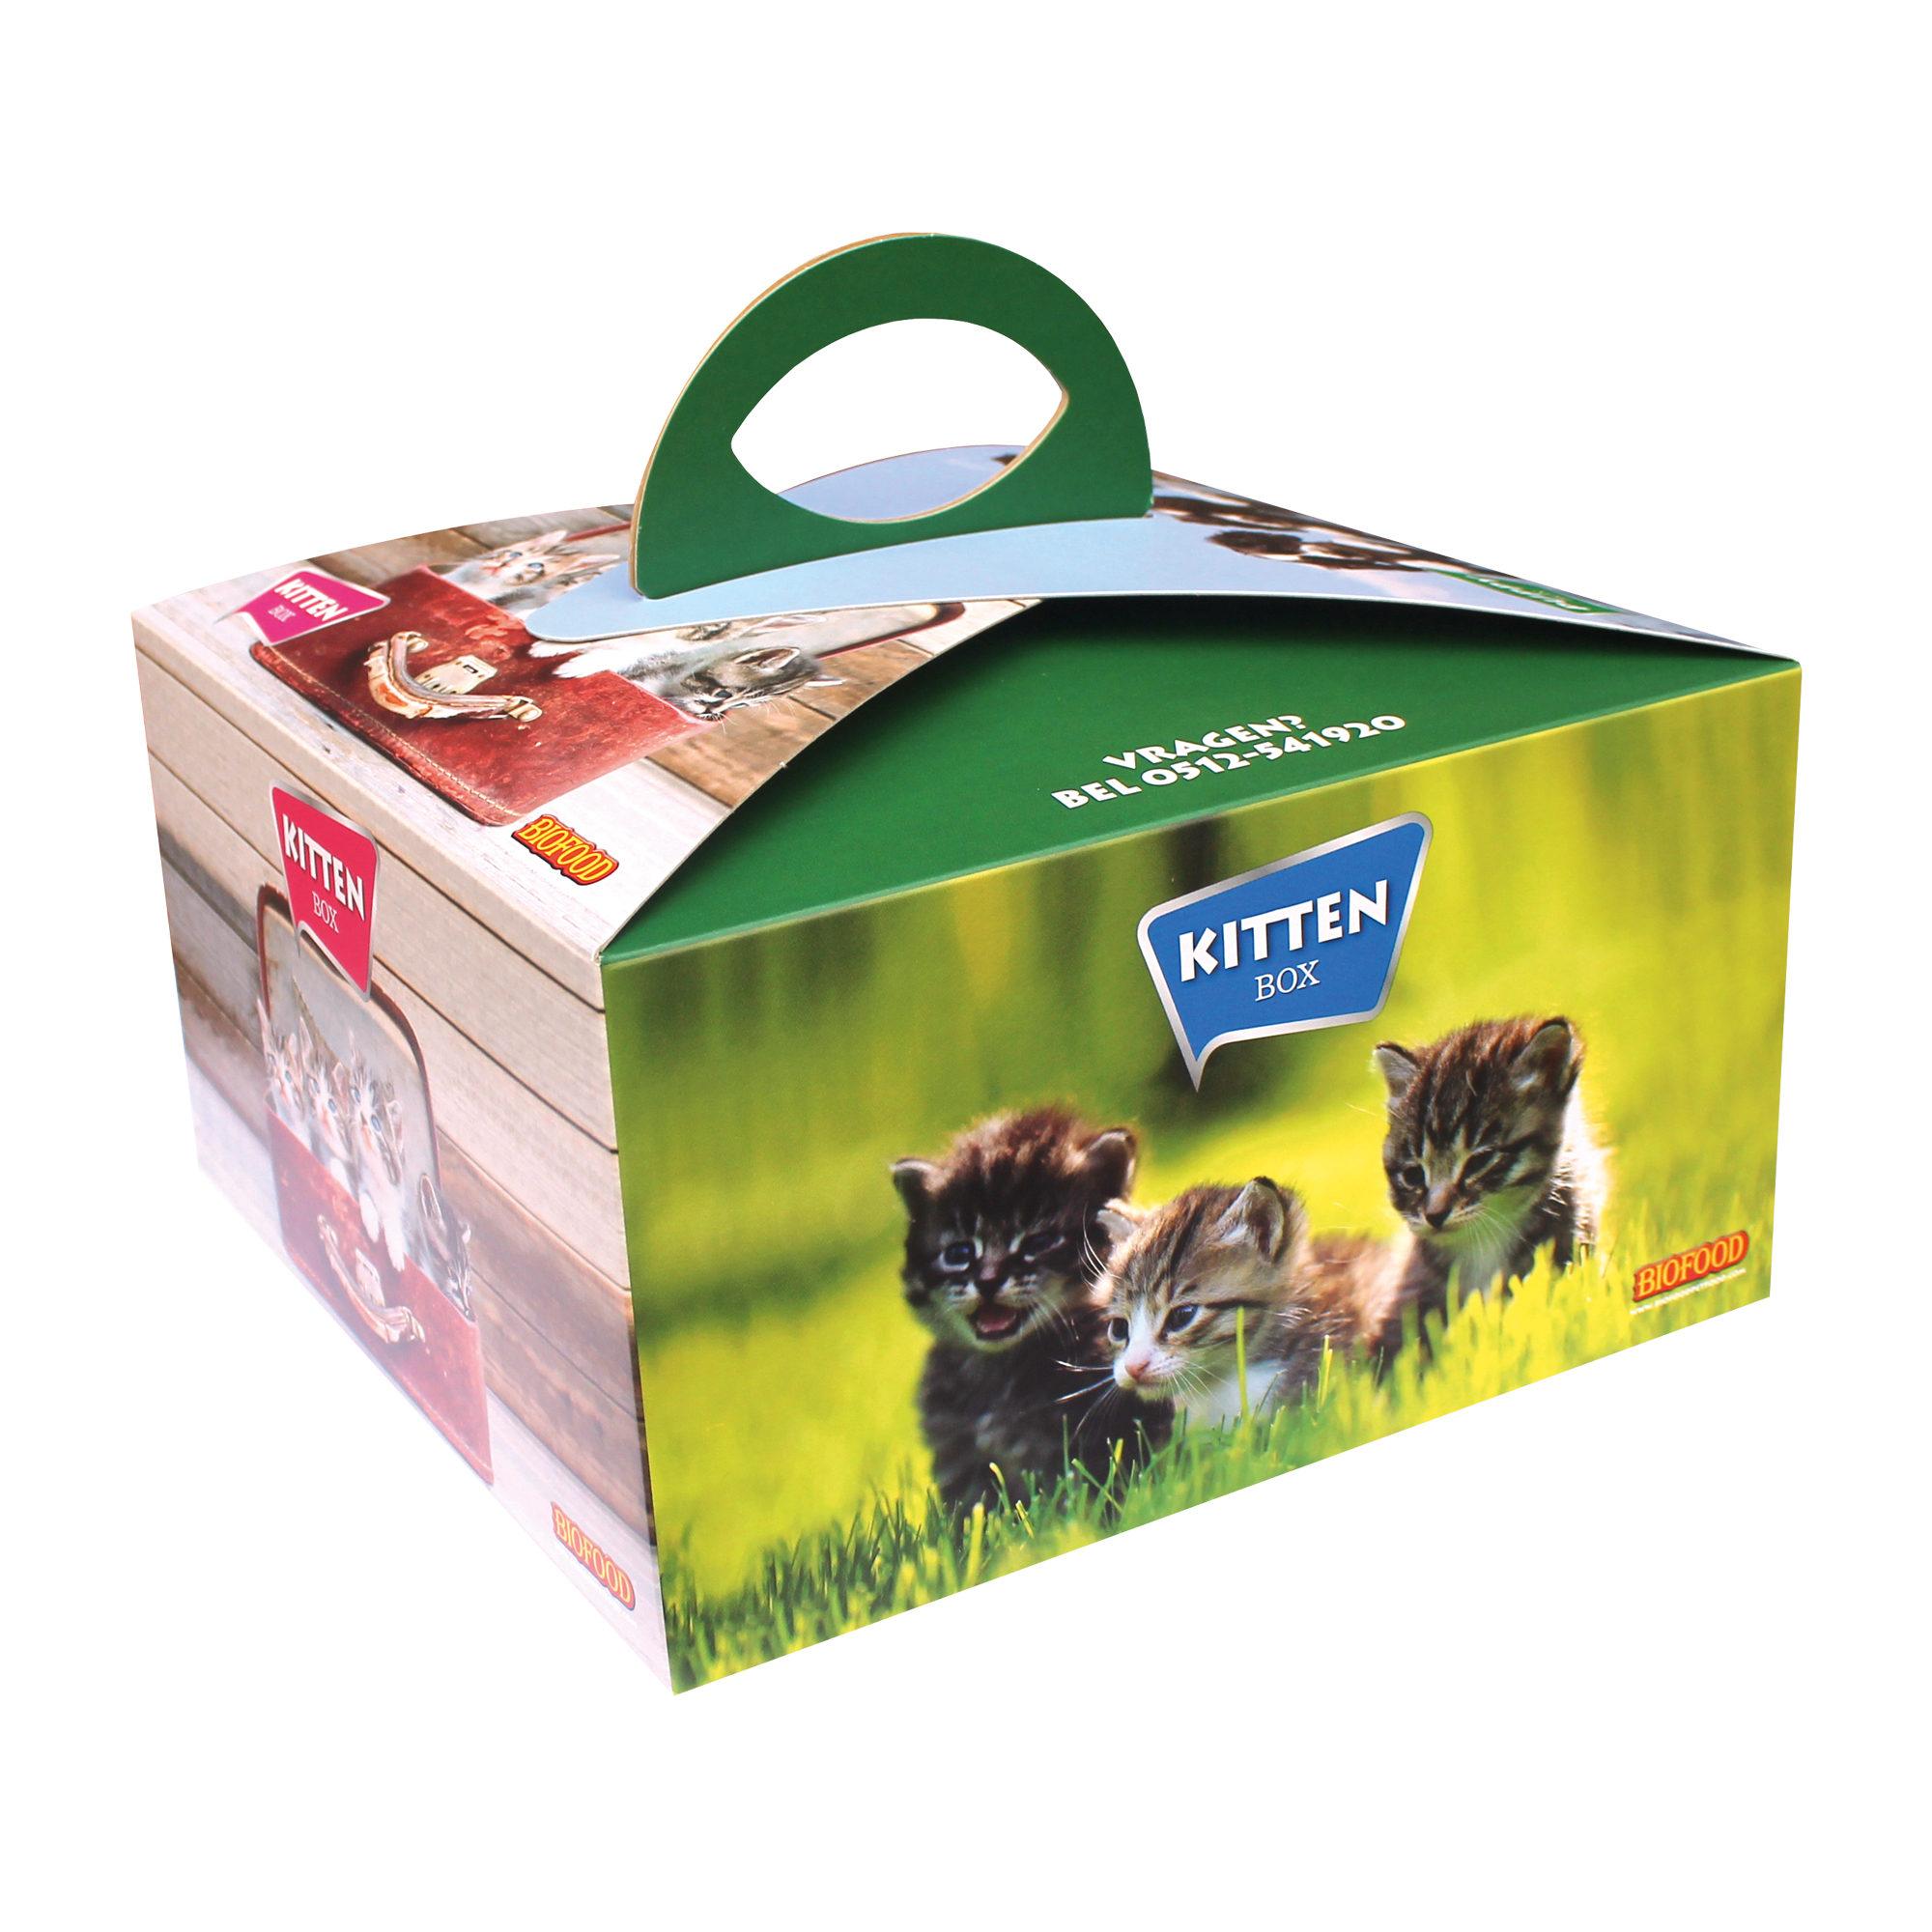 Biofood Kitten-Paket